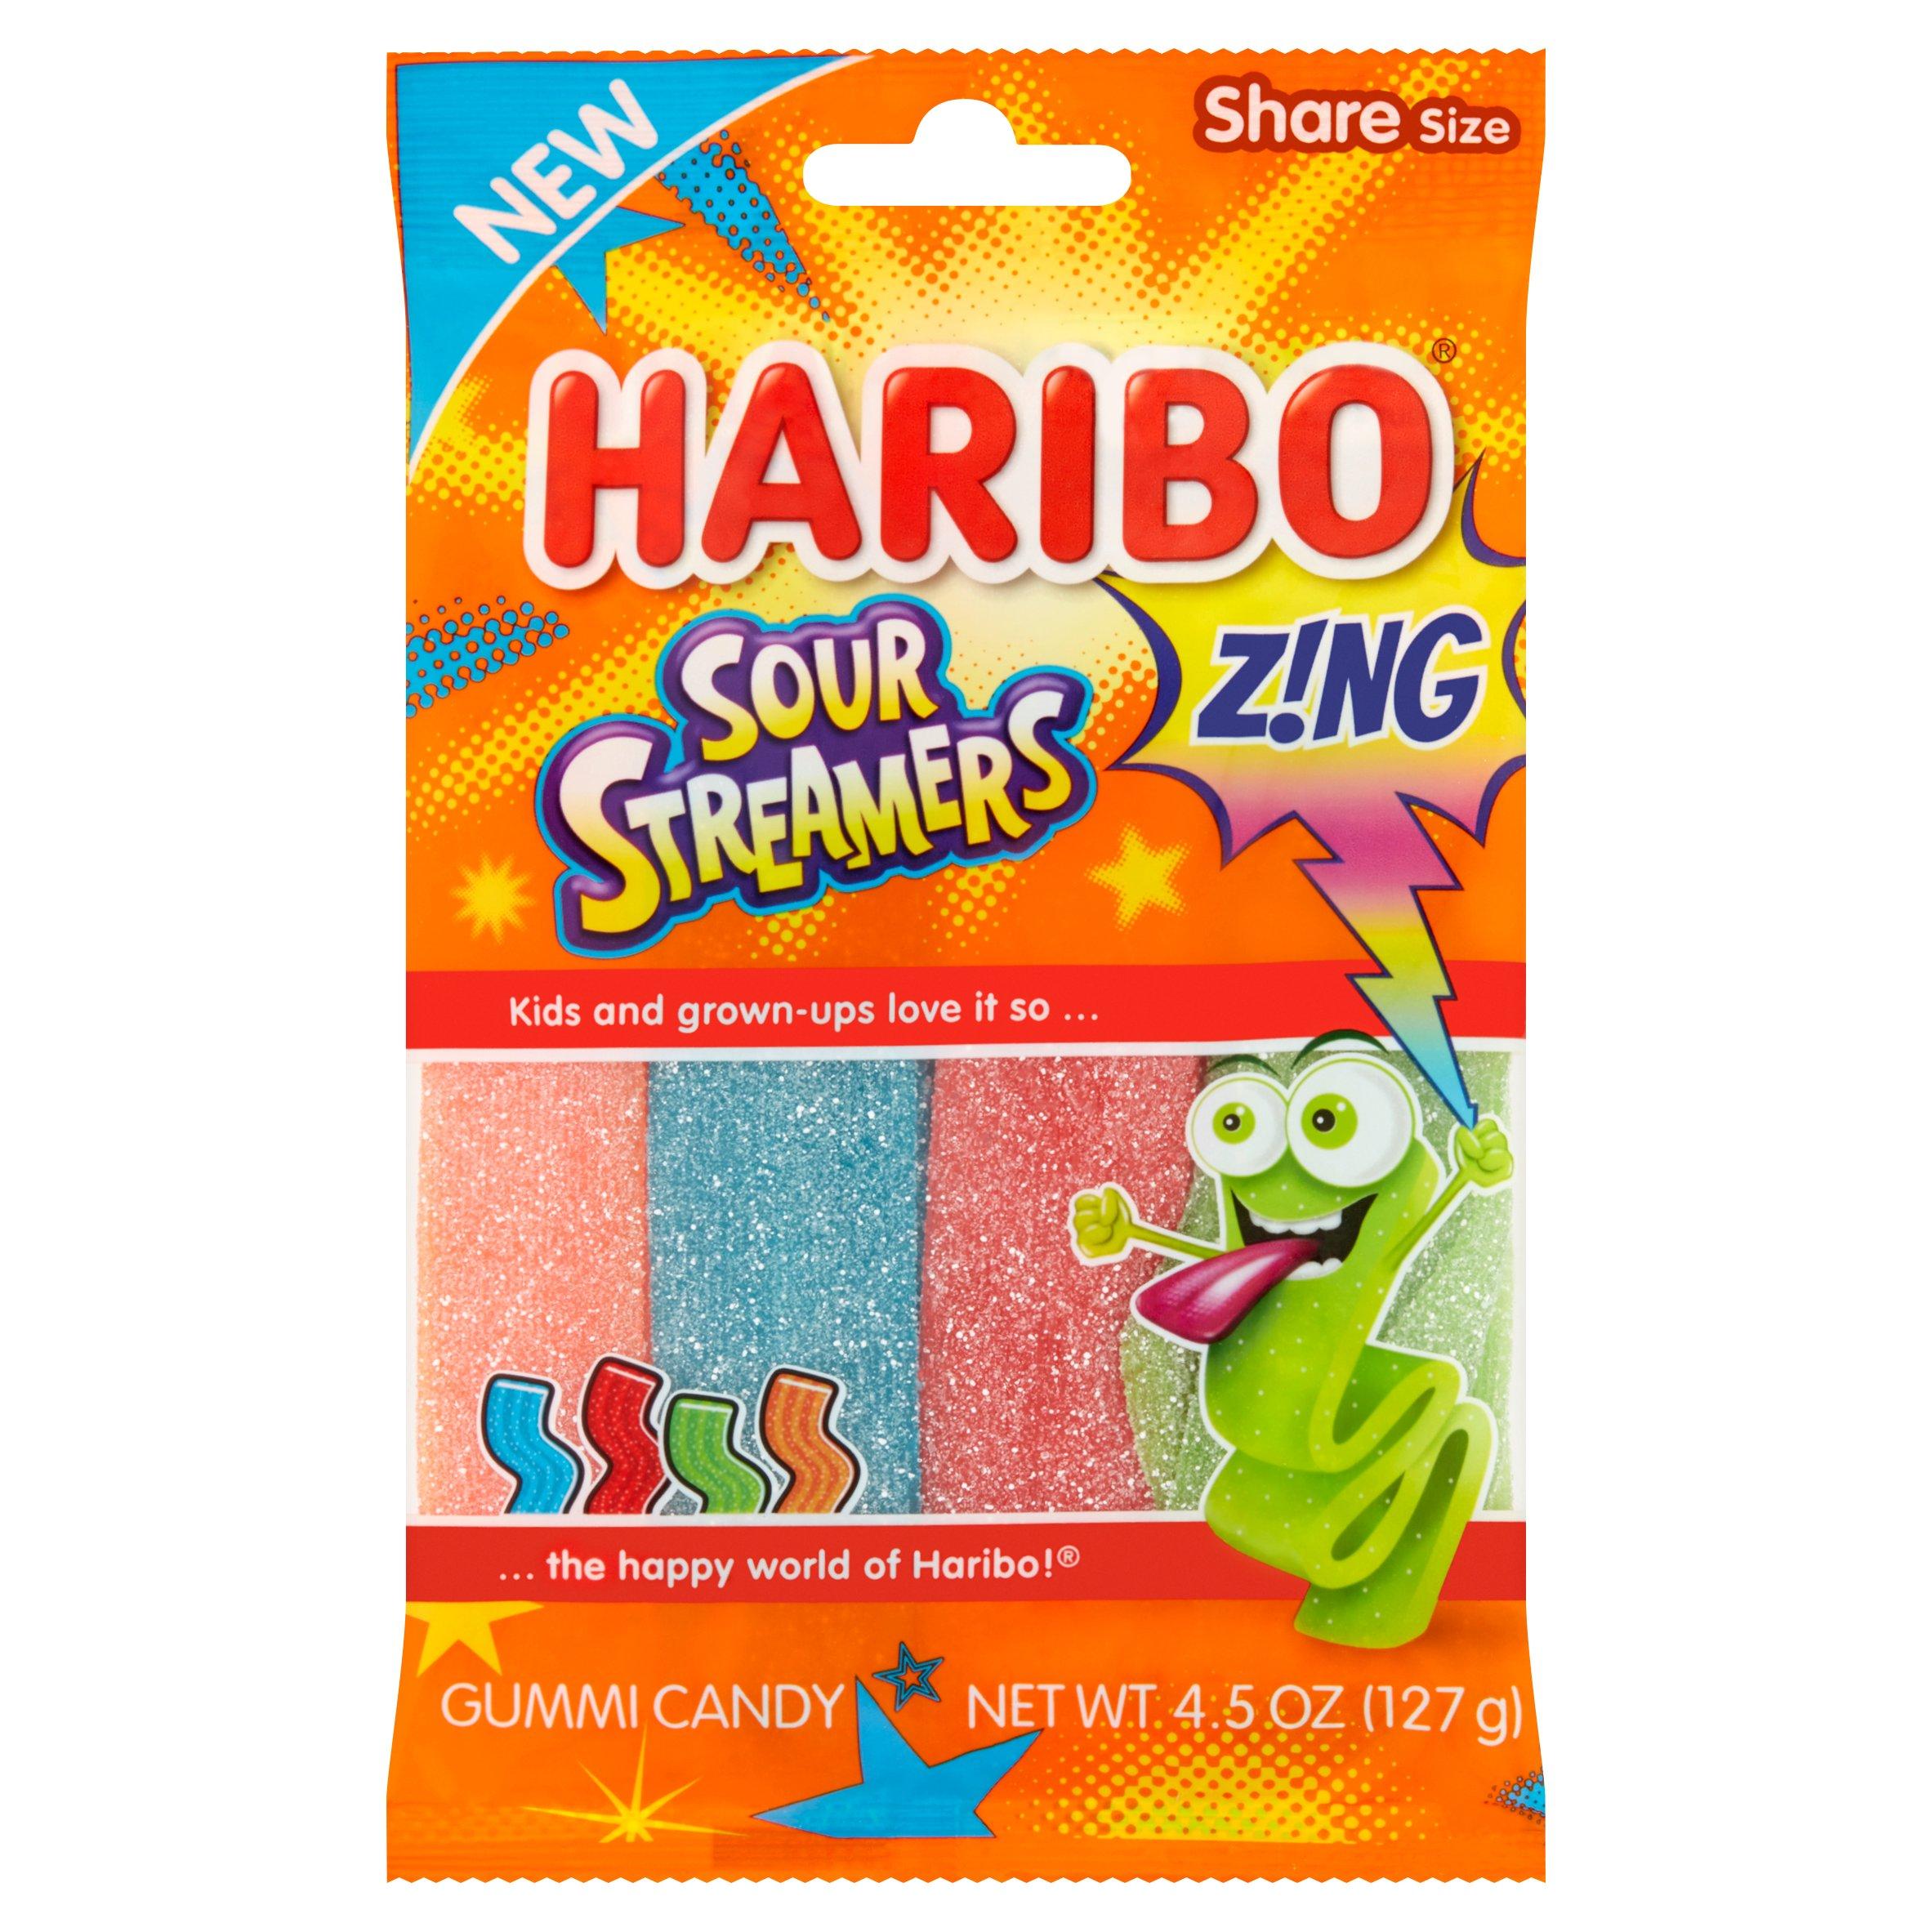 medium haribo gummy candy sour streamer 45 oz   WgXJCeVE